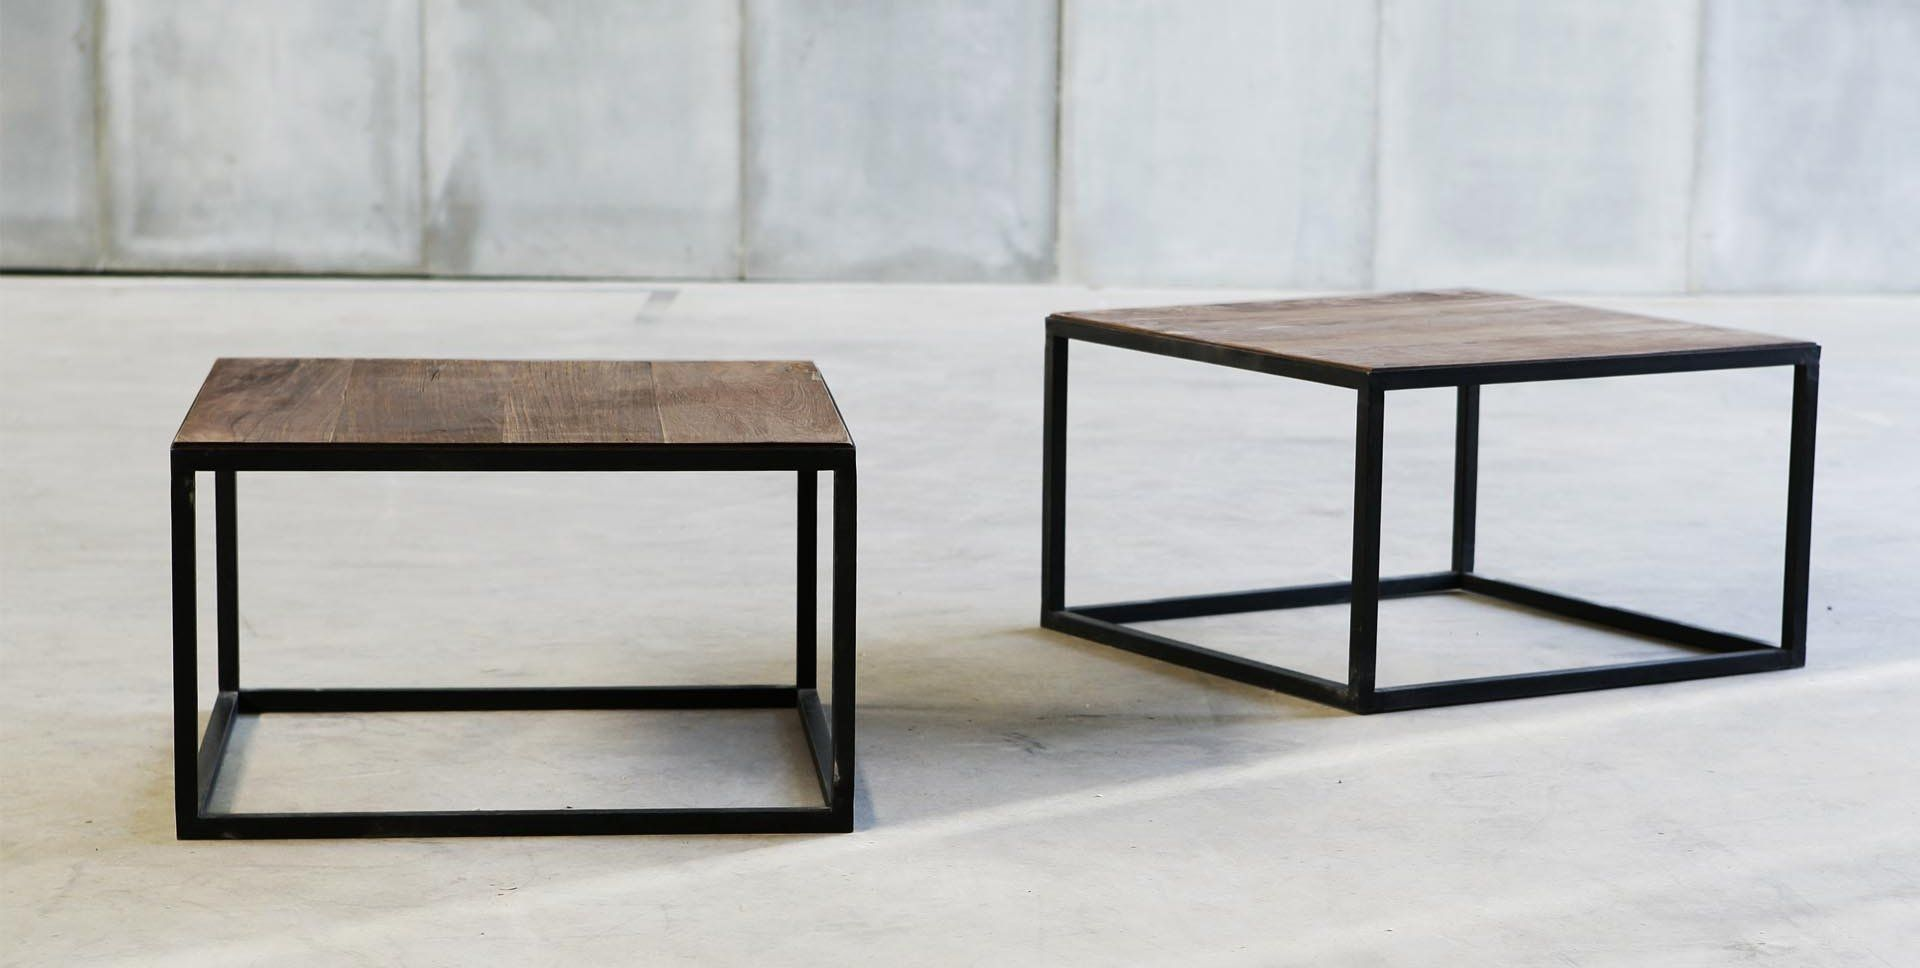 Couchtisch Modern Holz Aus Metall Starlight Metafor